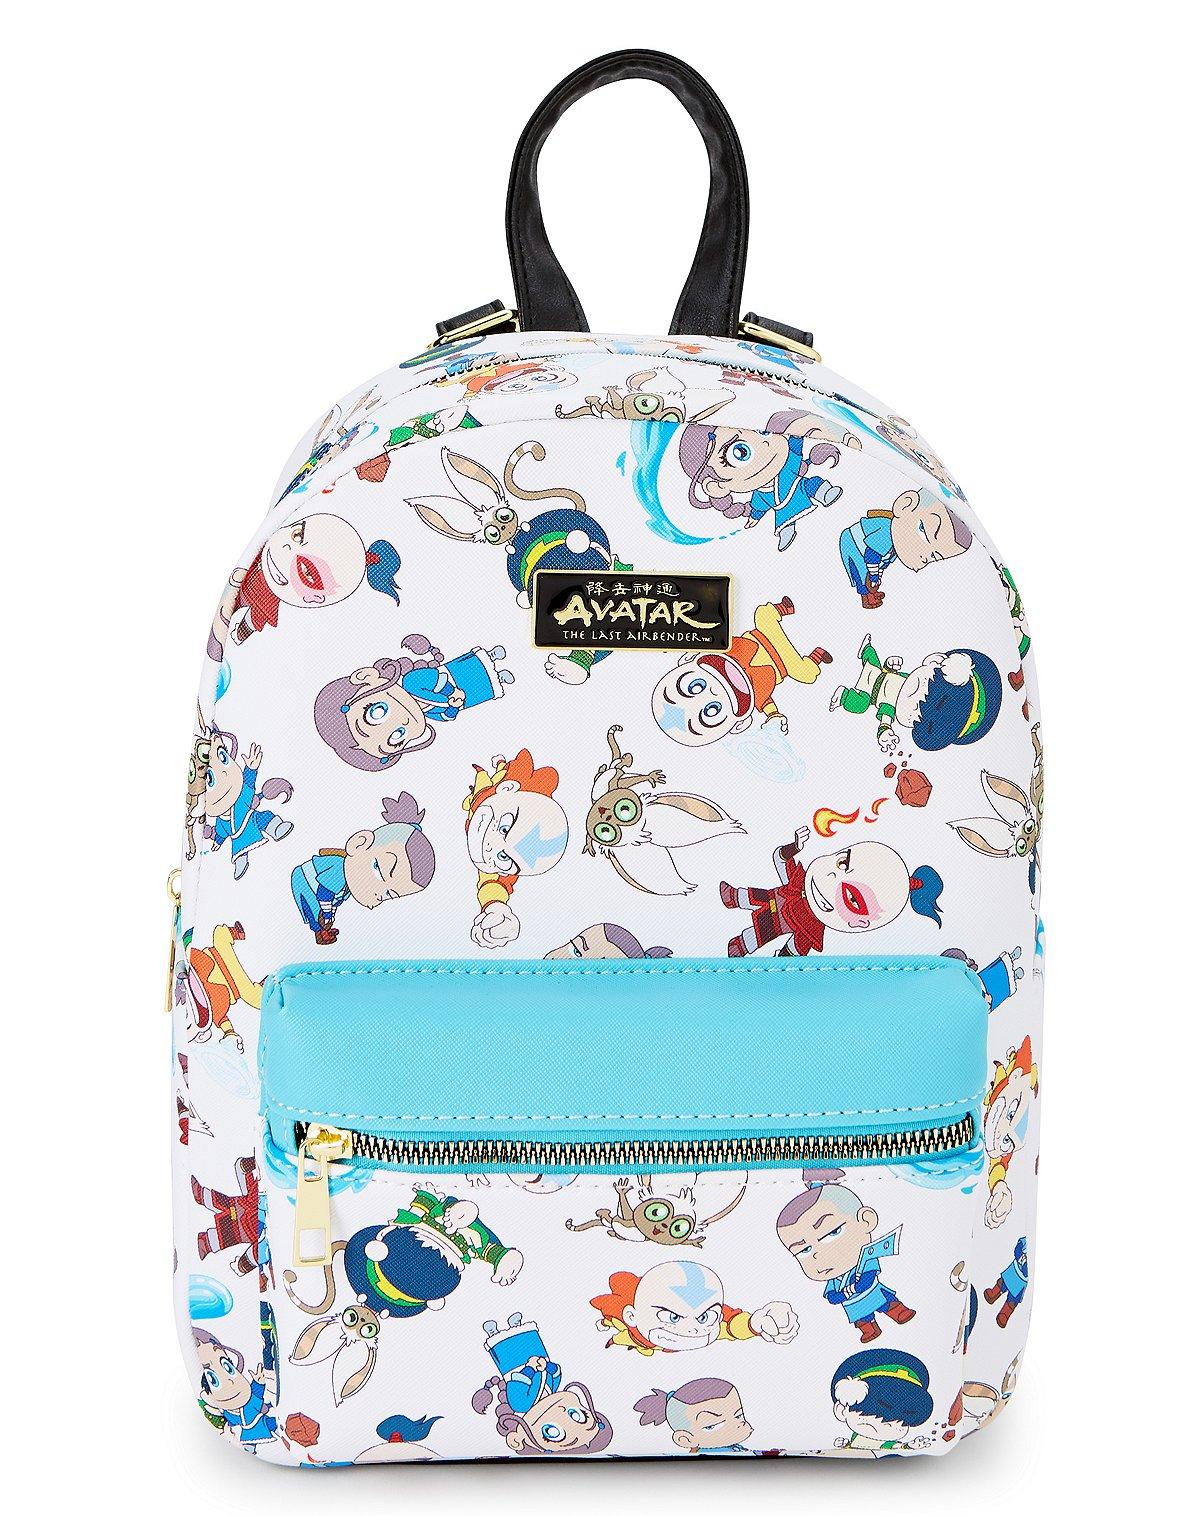 Avatar the Last Airbender Mini Backpack